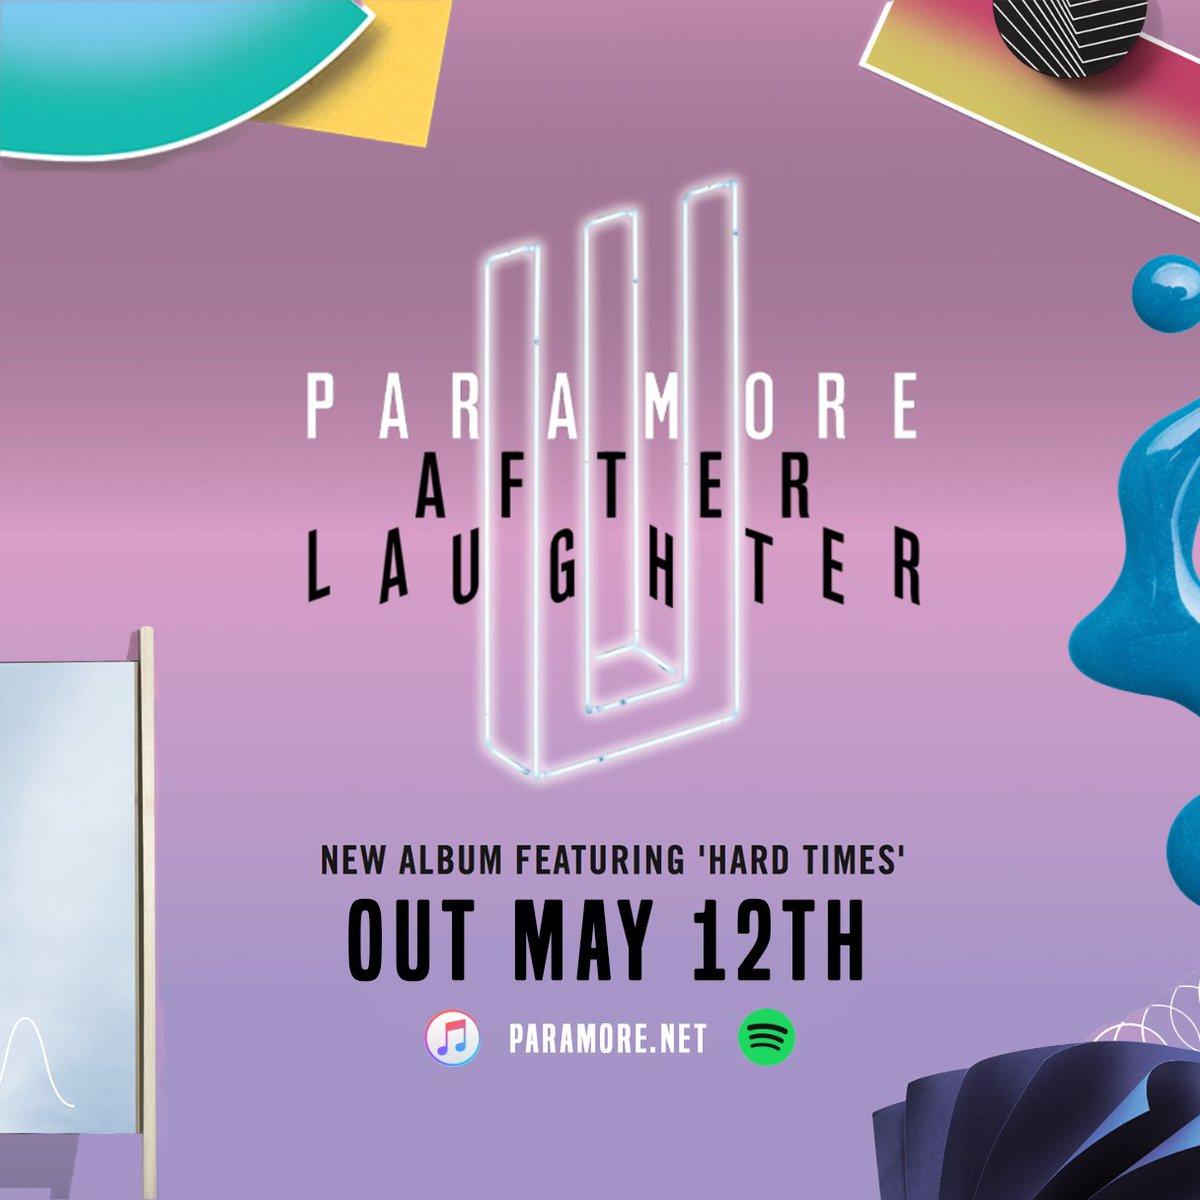 paramore 2017 album artwork - photo #23